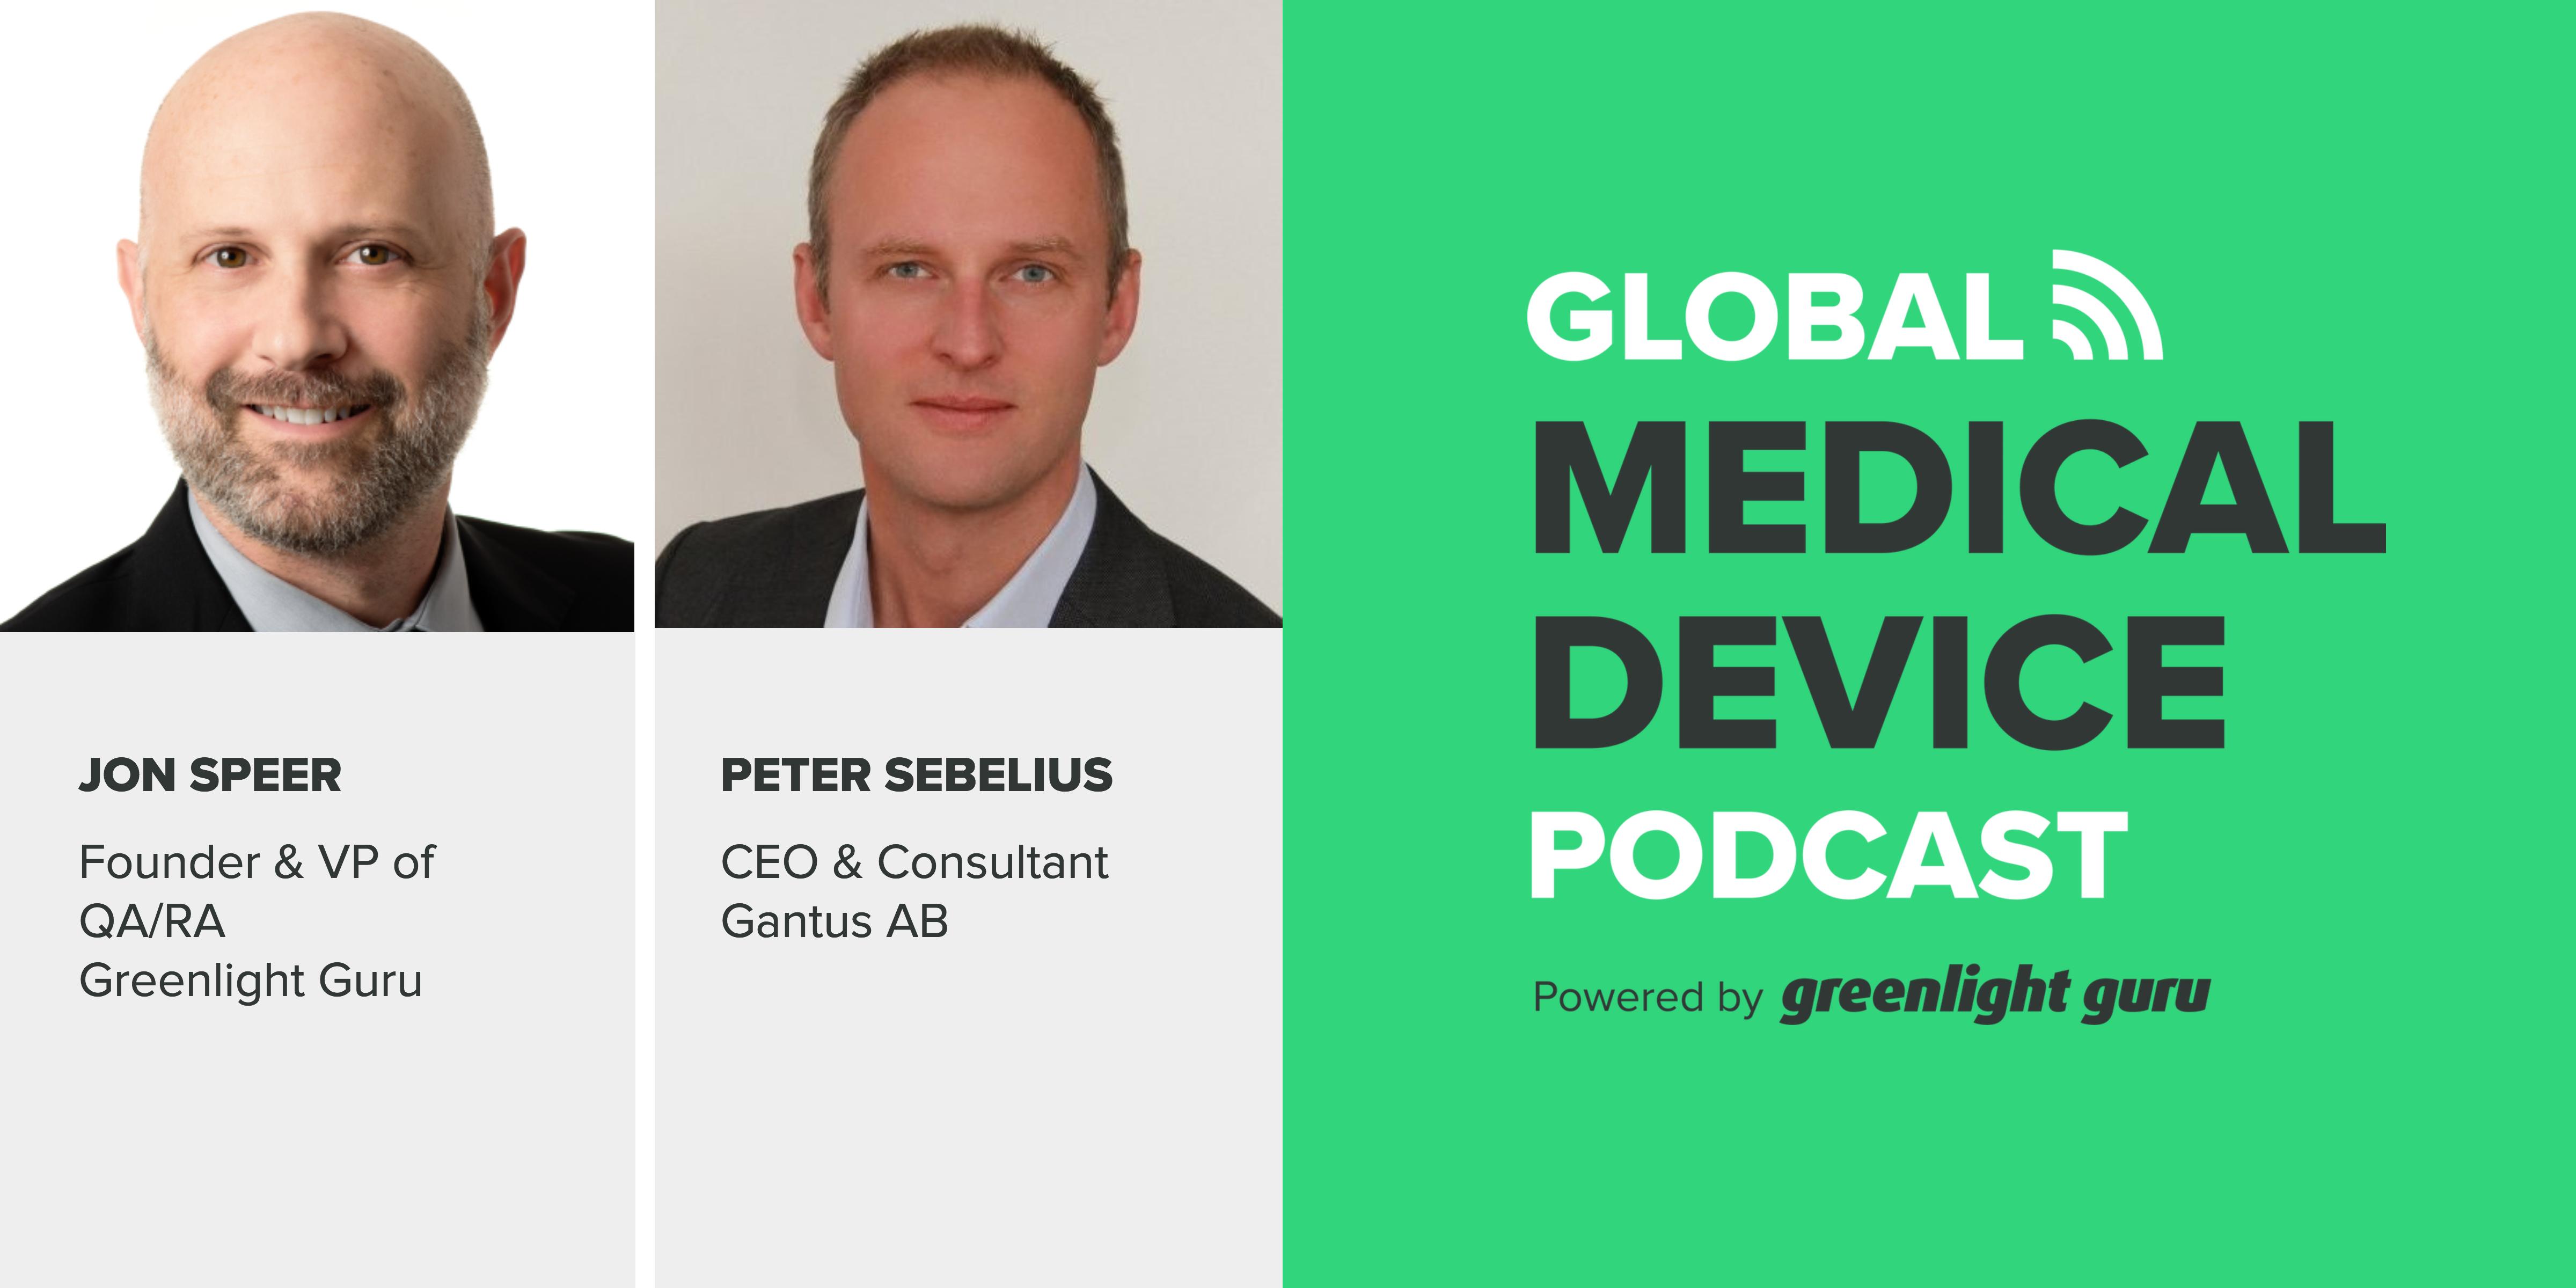 podcast_peter sebelius